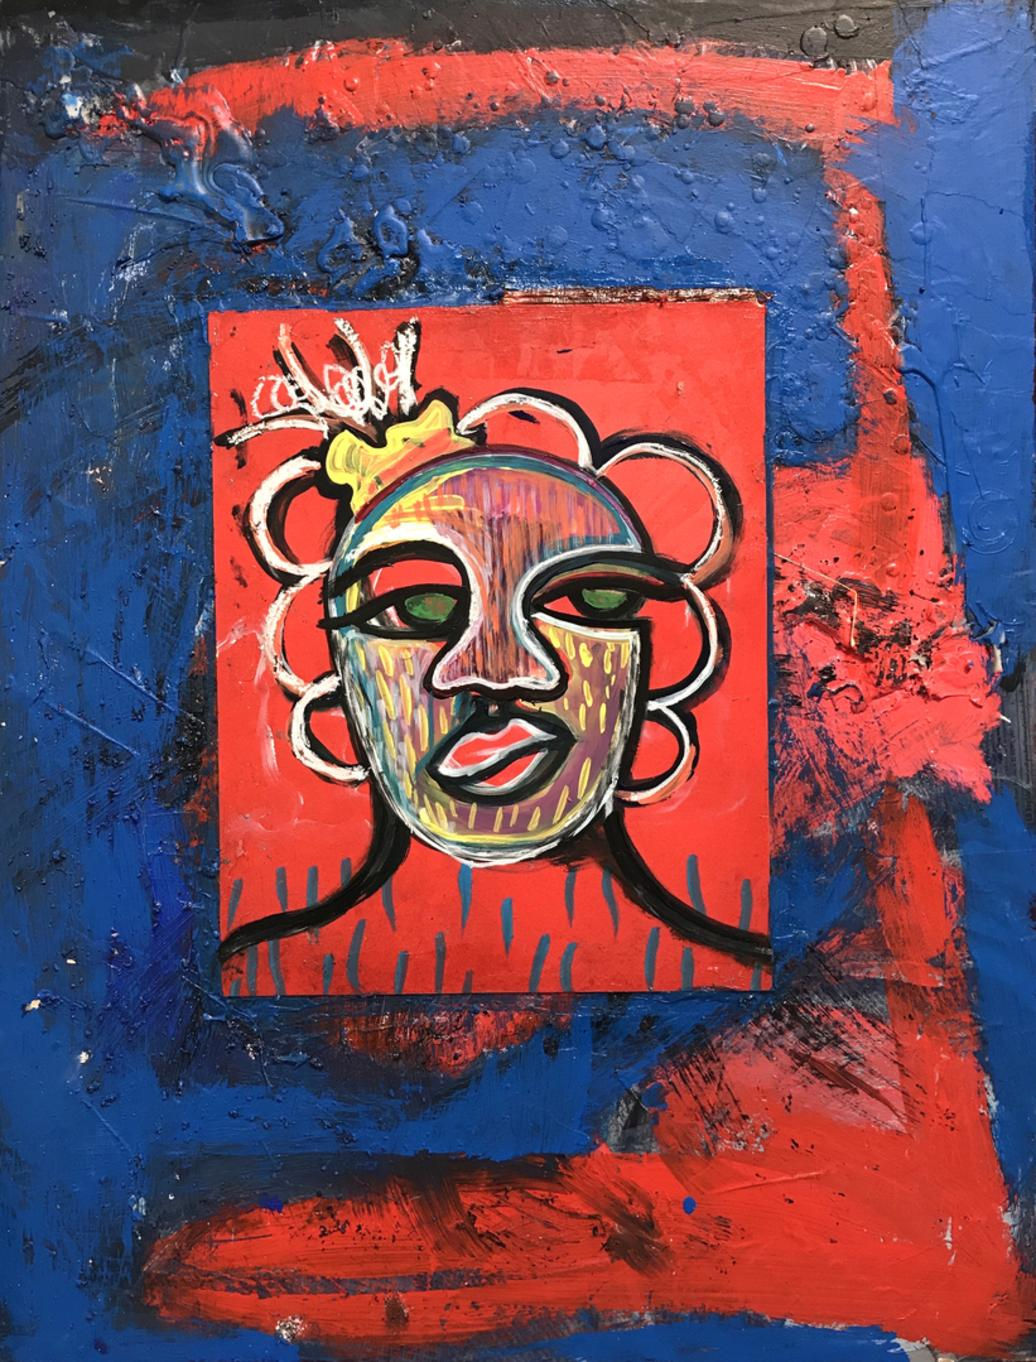 Nourishing Blue Memories (Triptych), 18x24 each, Acrylic, gouache on canvas 2017  - 3/3